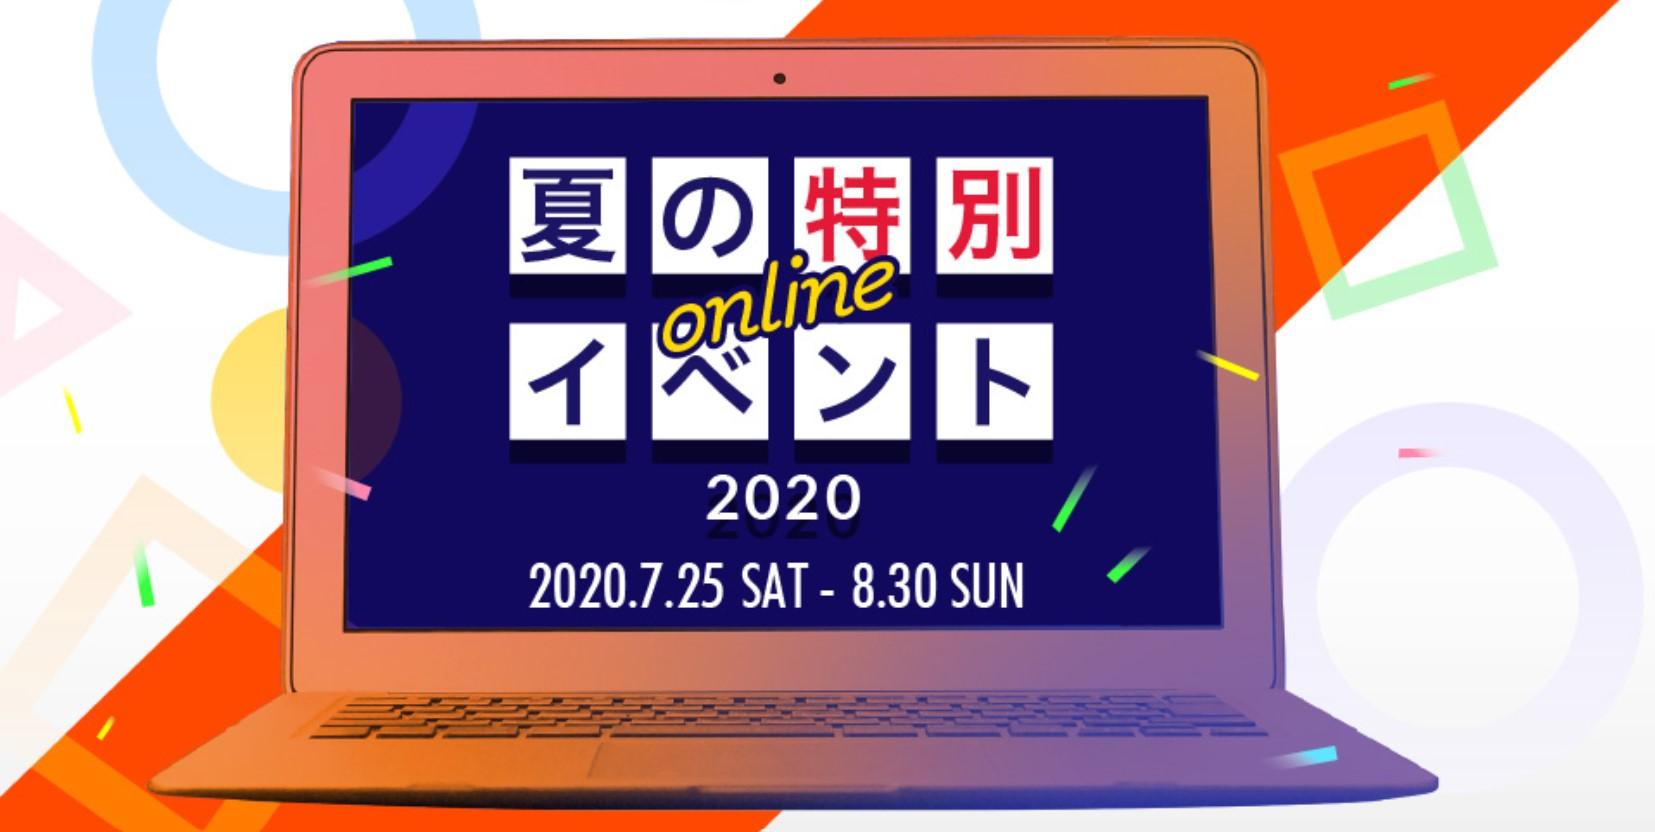 LITALICOワンダー夏の特別オンラインイベント開始【8月8日(日)~30(日)まで定期開催】